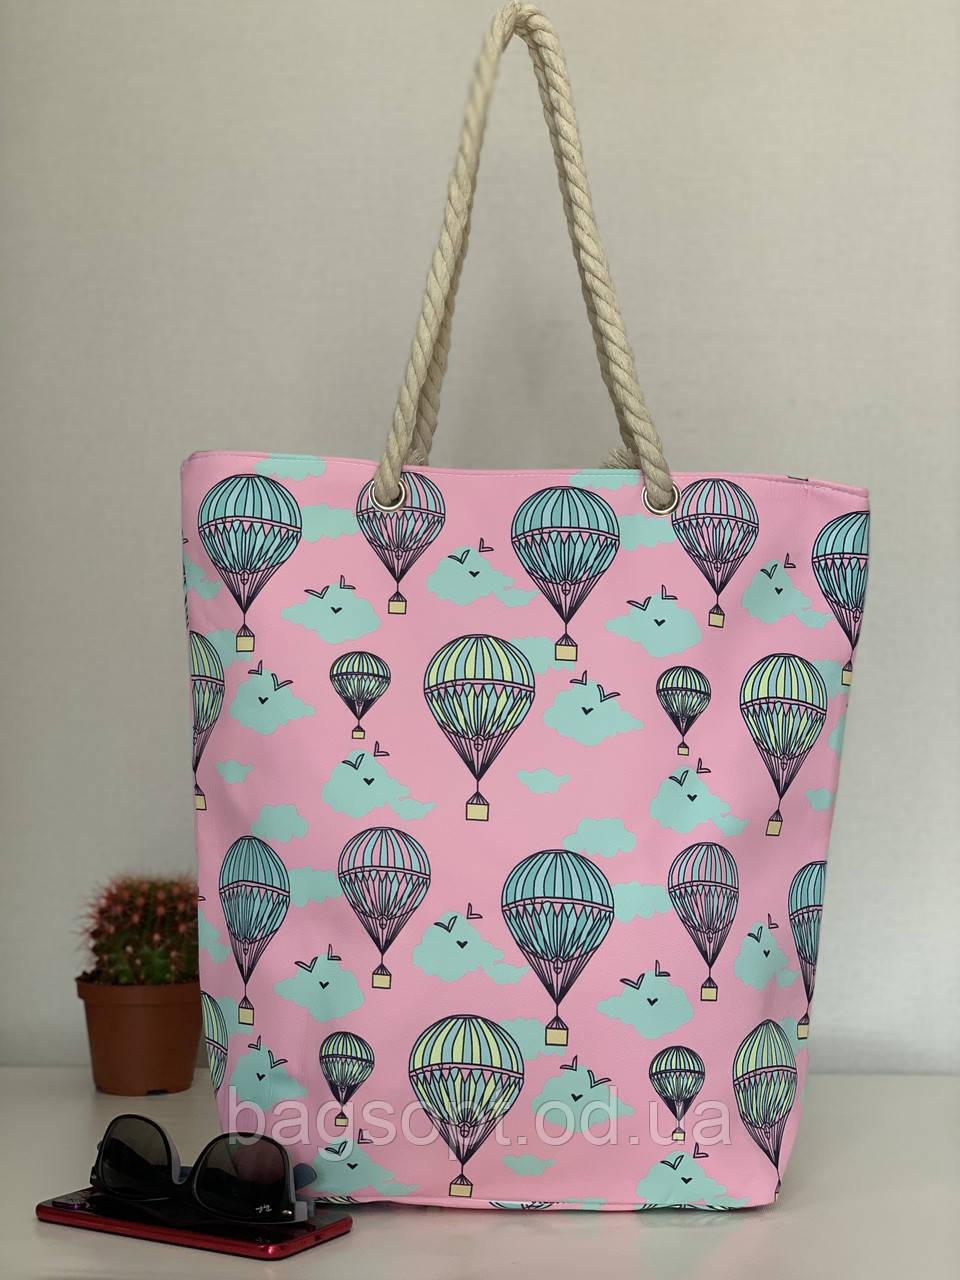 Пляжная сумка шоппер розовая текстильная хлопковая летняя